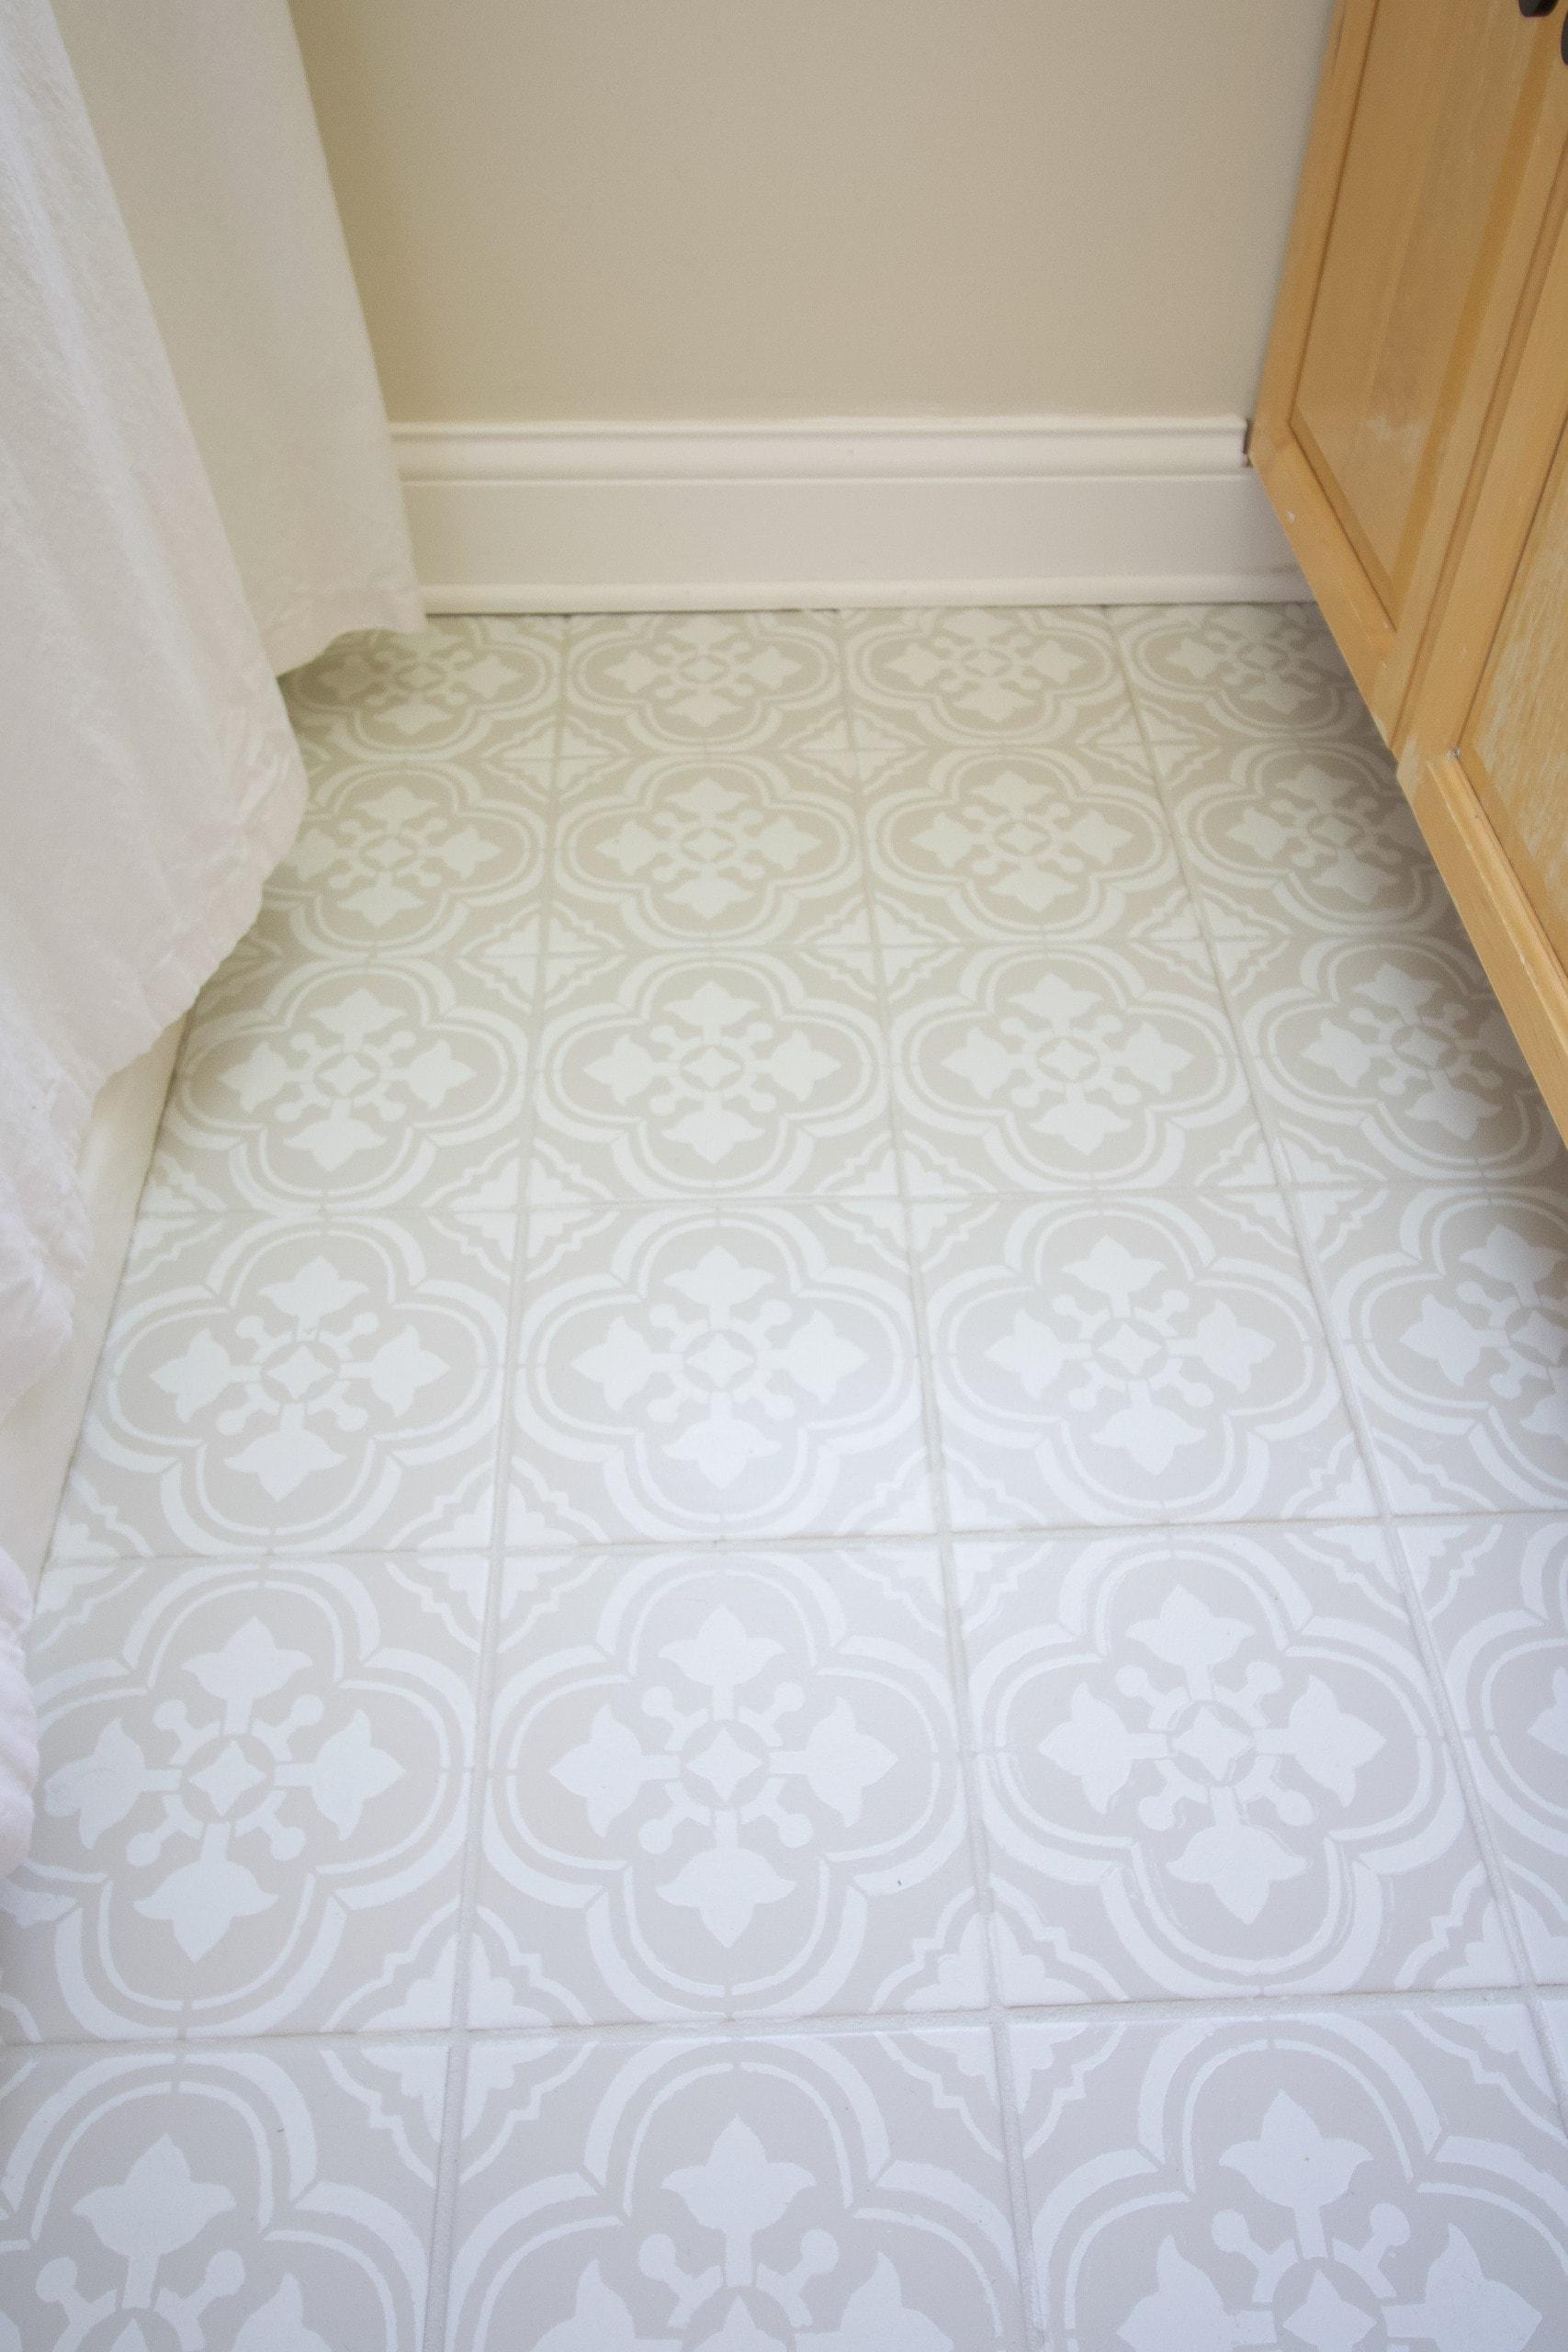 My bathroom floor tile